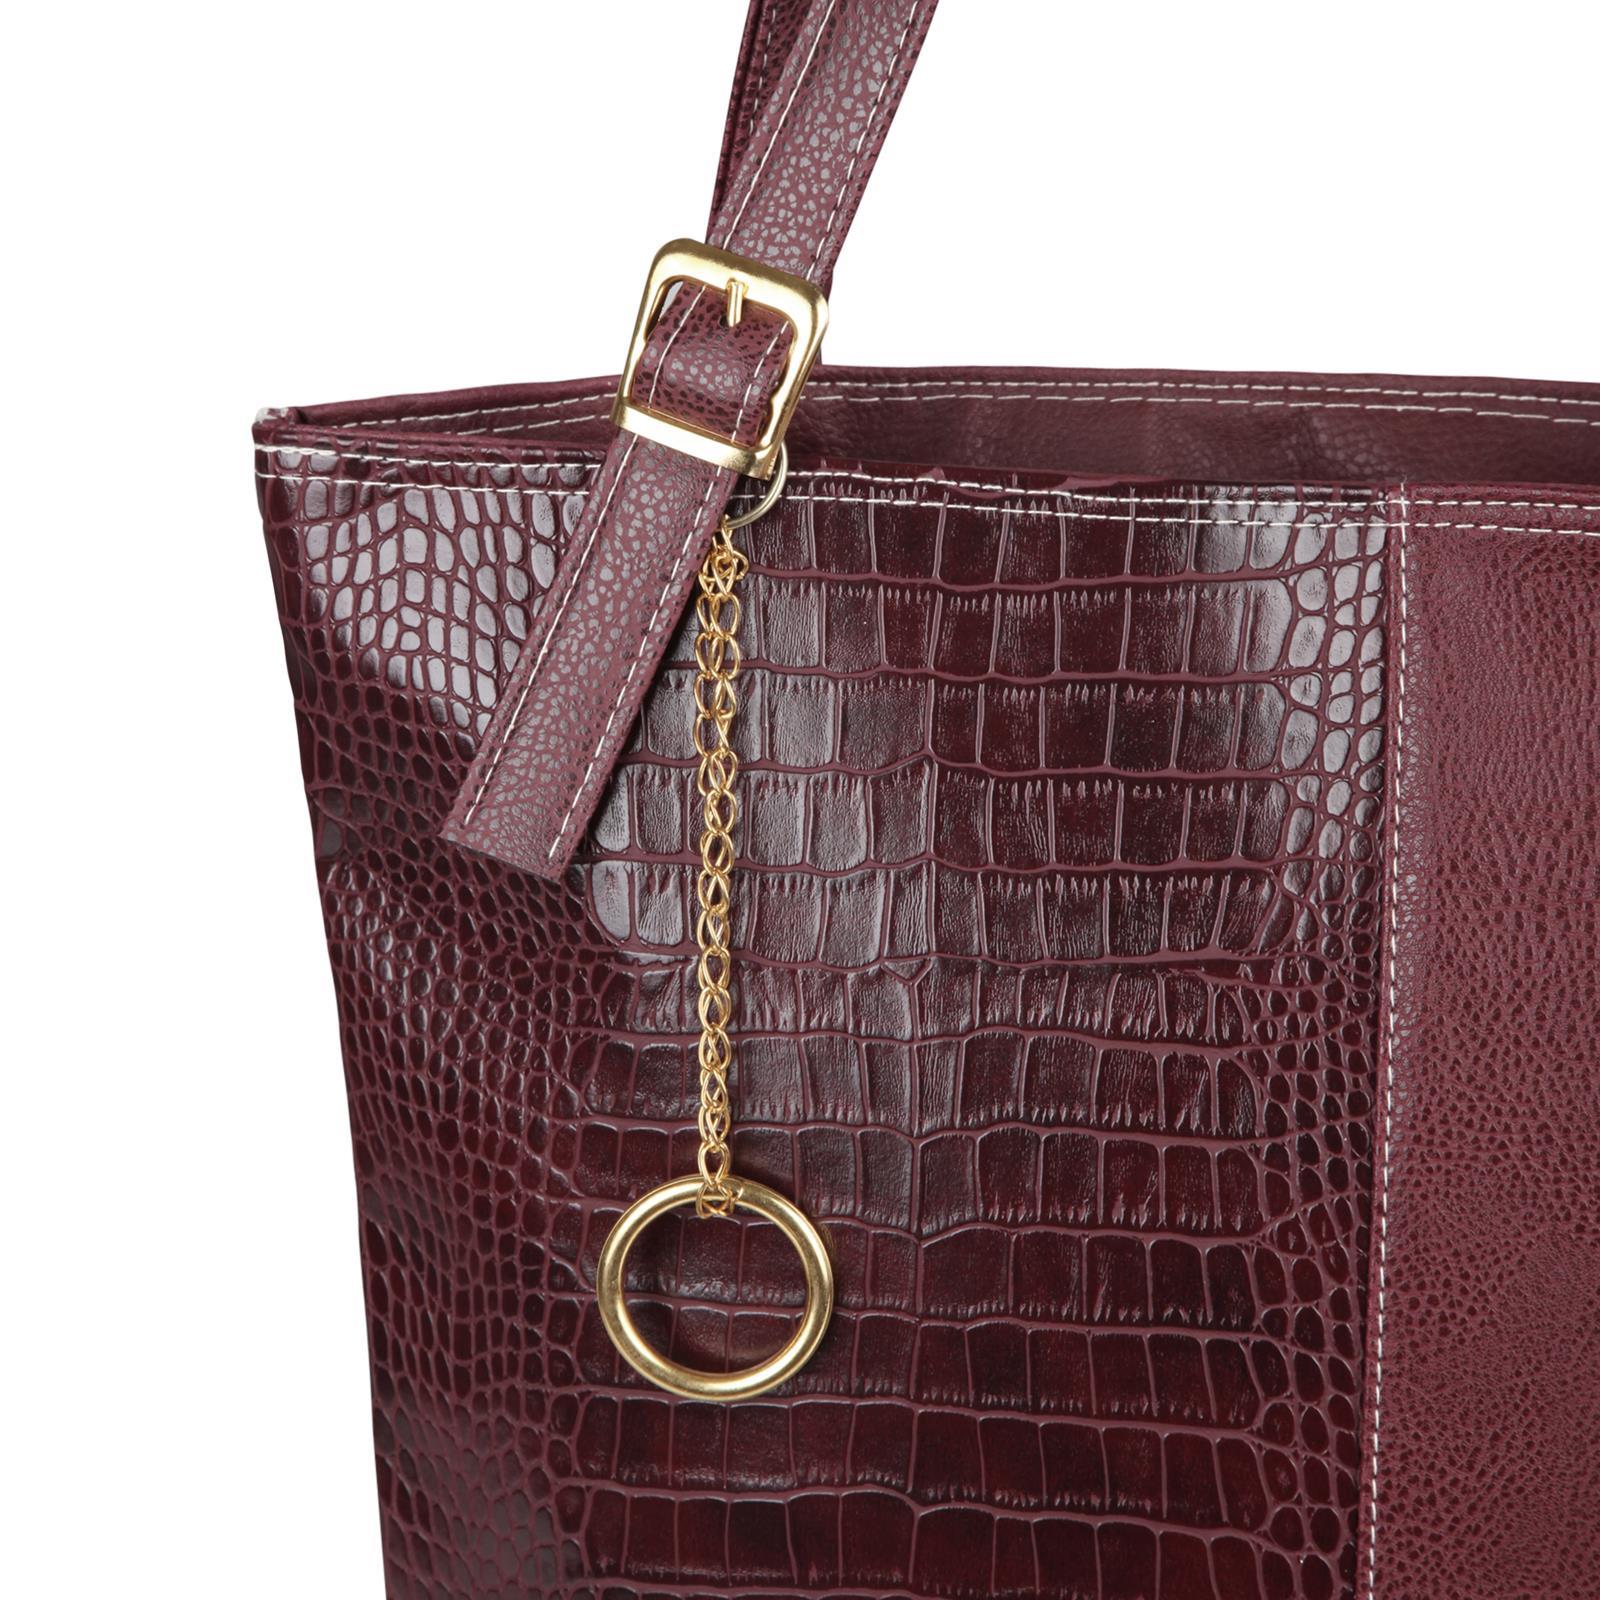 Animal-Print-Handbag-PU-Leather-Shoulder-Bag-Work-Office-Tote-Shopper-Fashion thumbnail 15